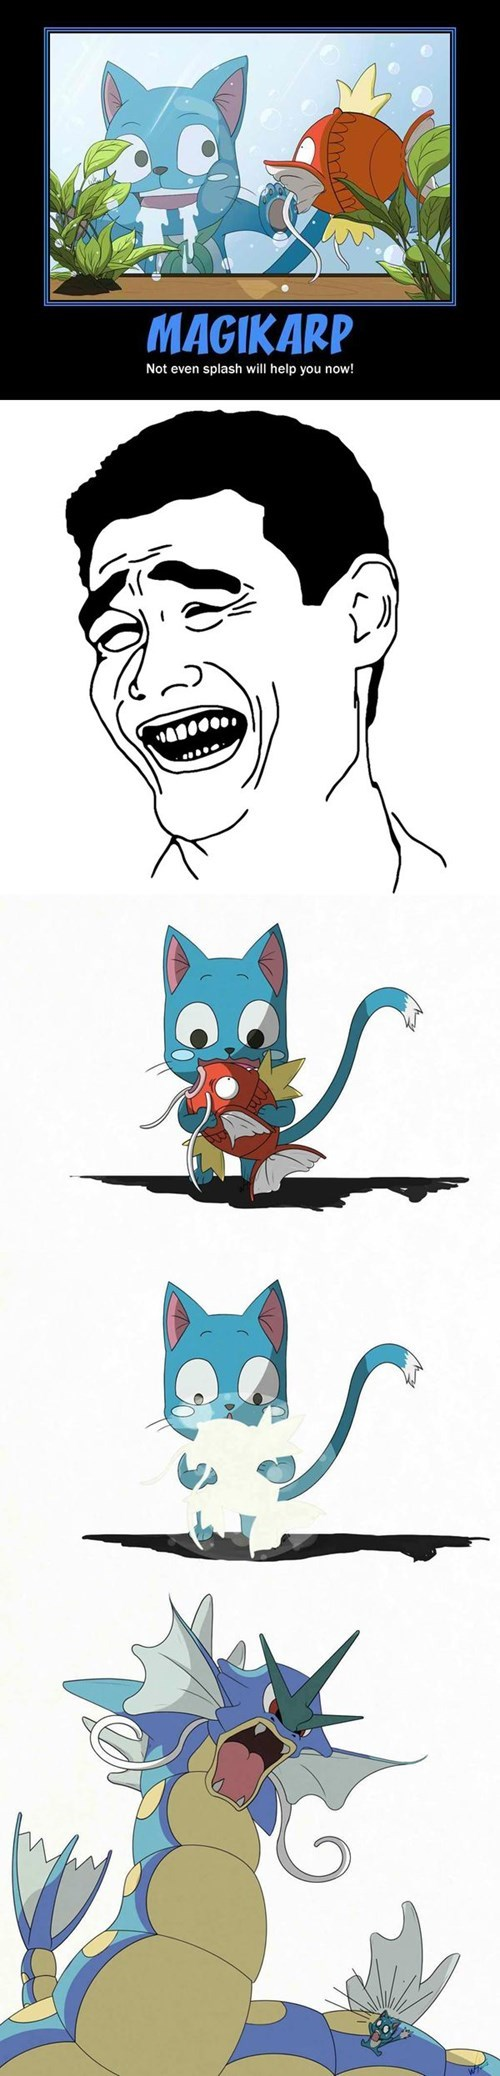 pokemon memes happy fairy tail gyrados magikarp